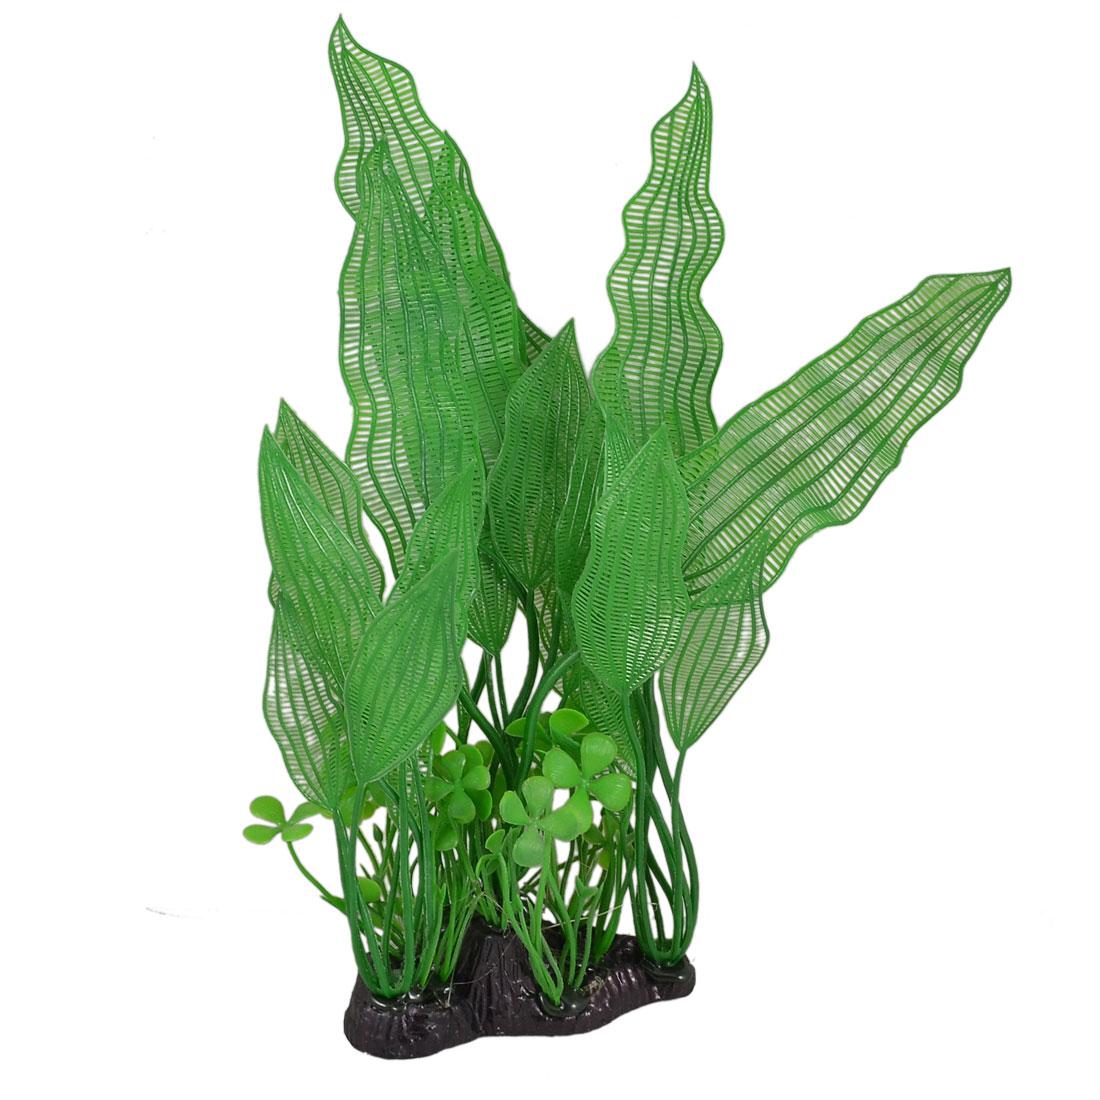 30cm Height Artificial Plastic Grass Green for Aquarium